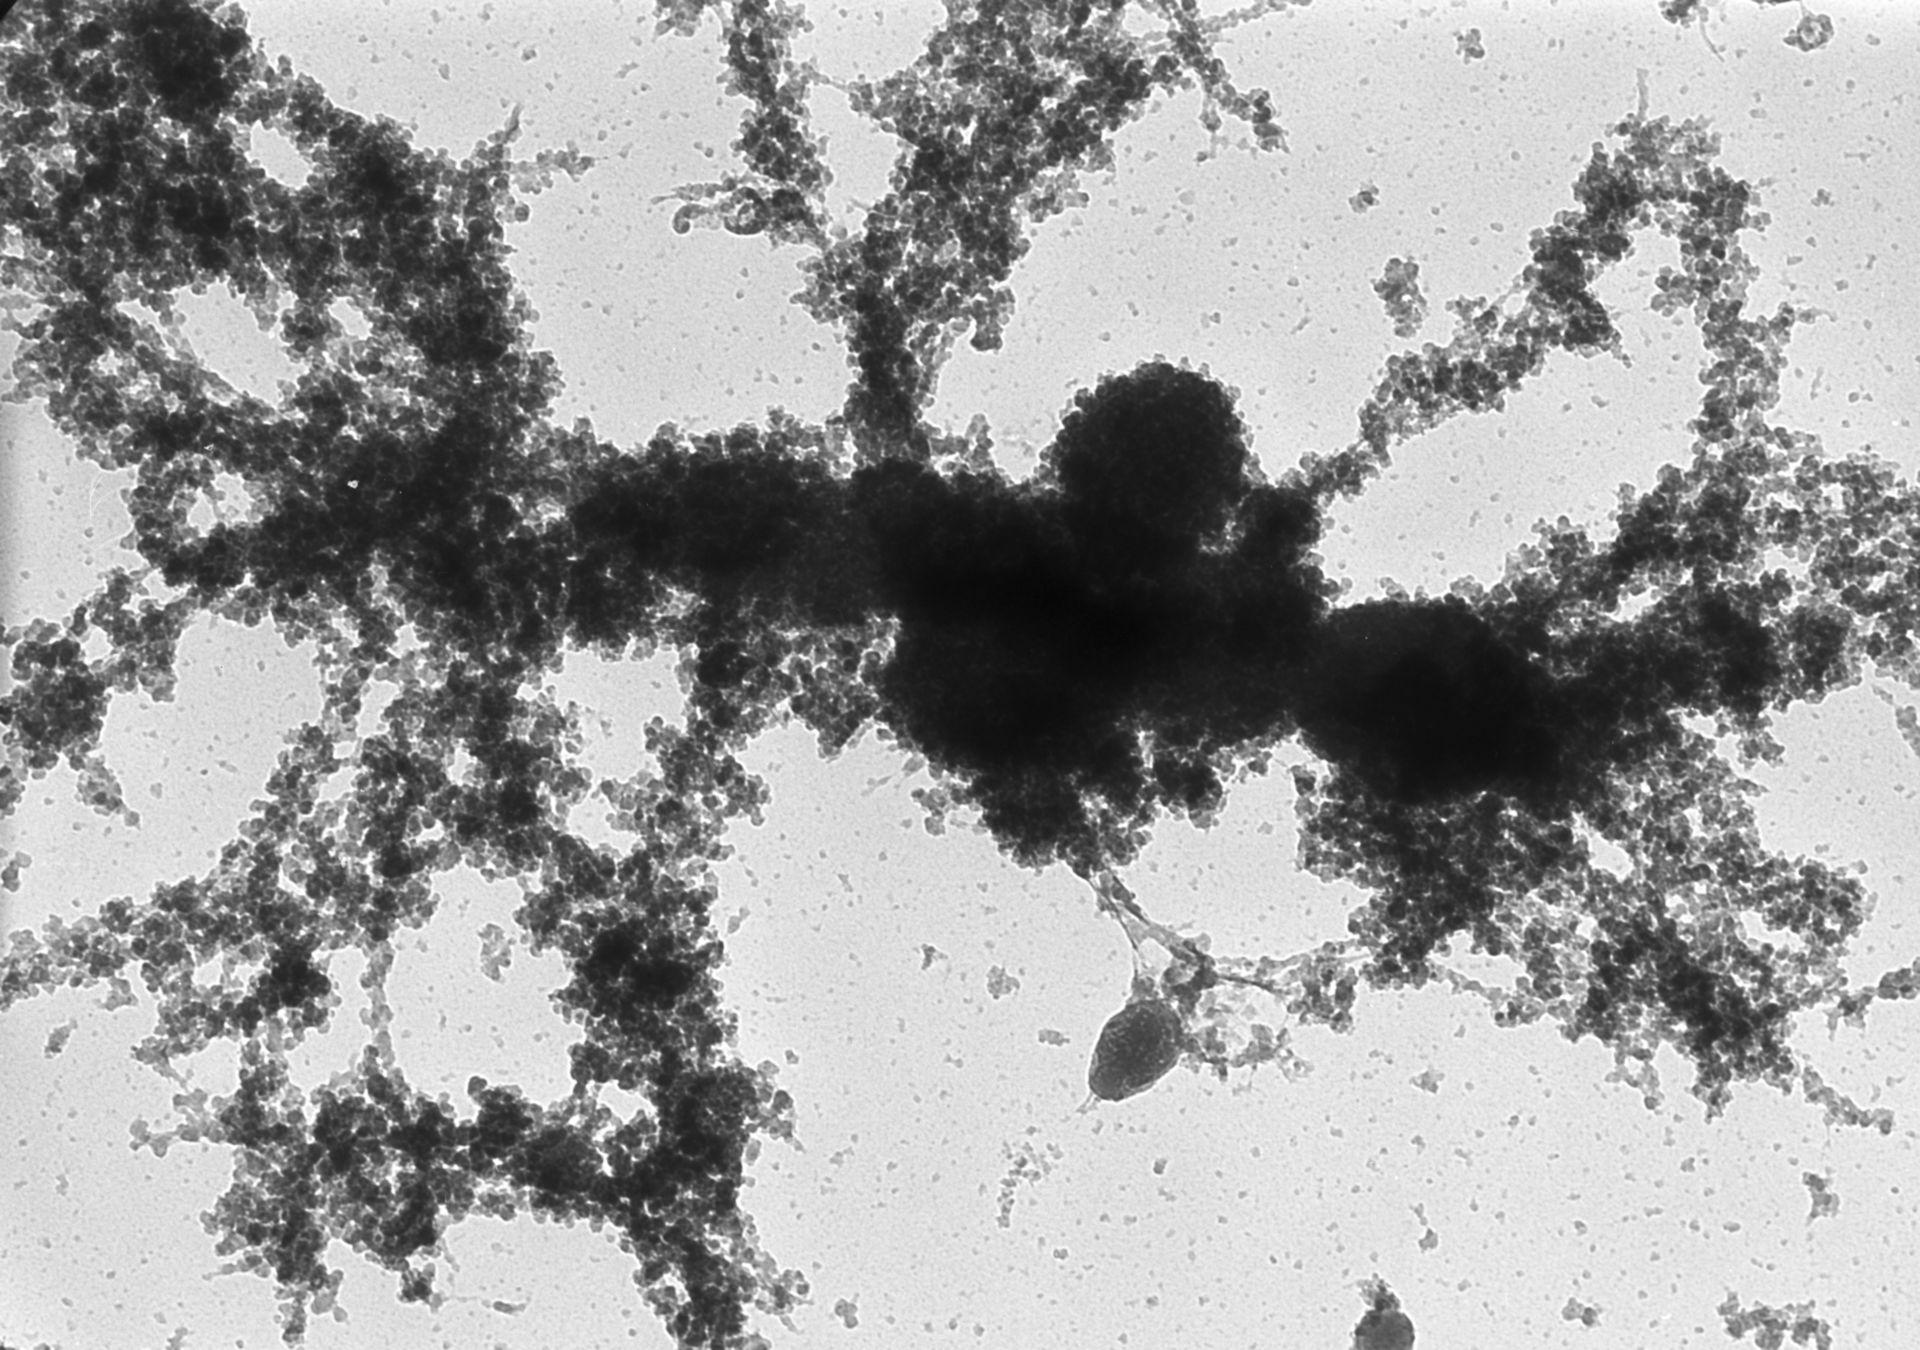 Notophthalmus viridescens (Lampbrush chromosomes) - CIL:10717